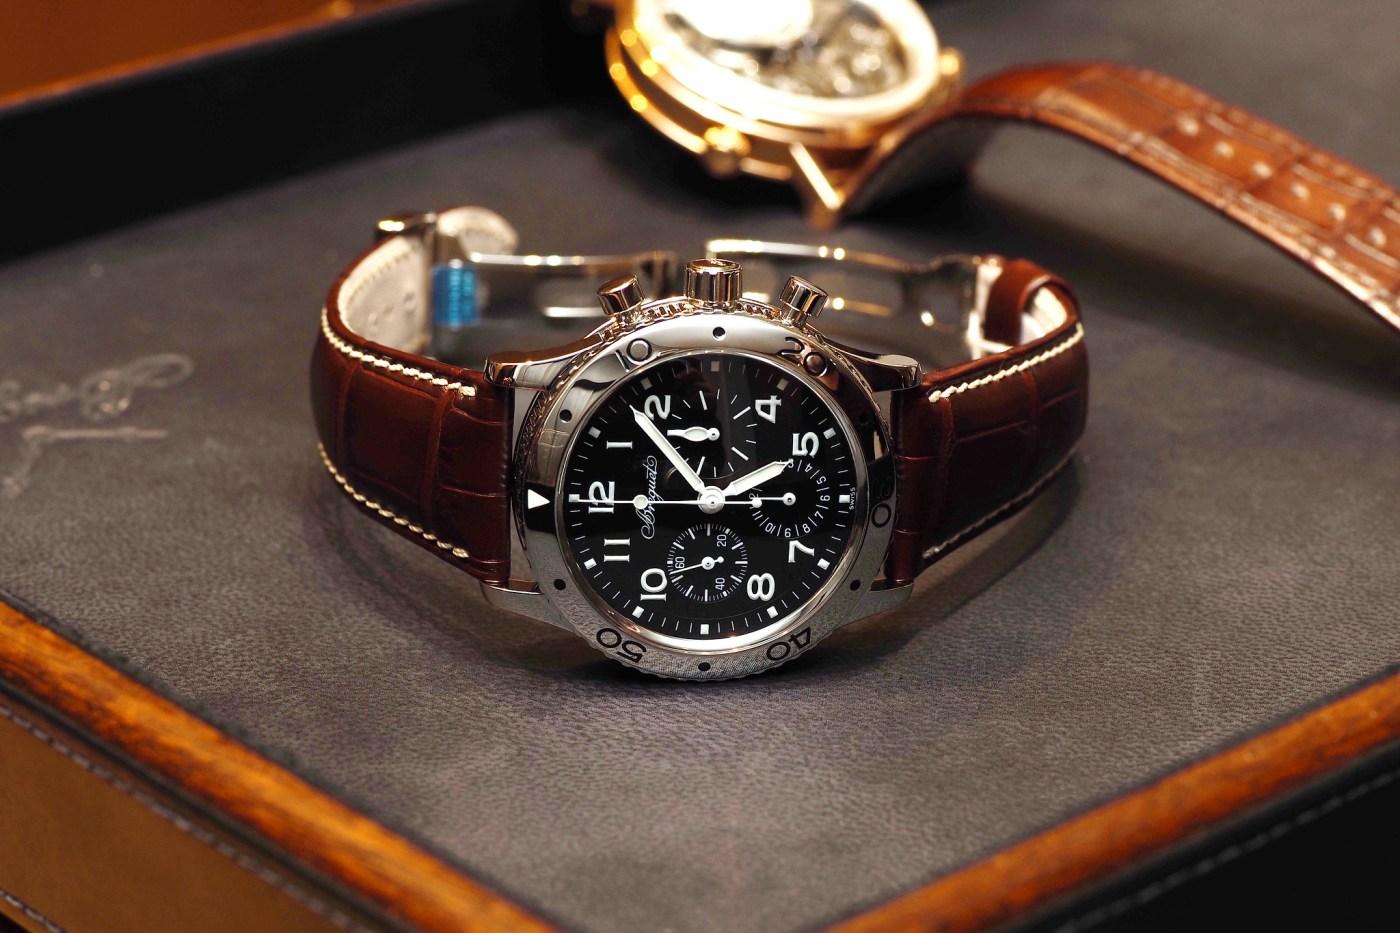 Breguet Type XX Aeronavale 3800ST Chronograph